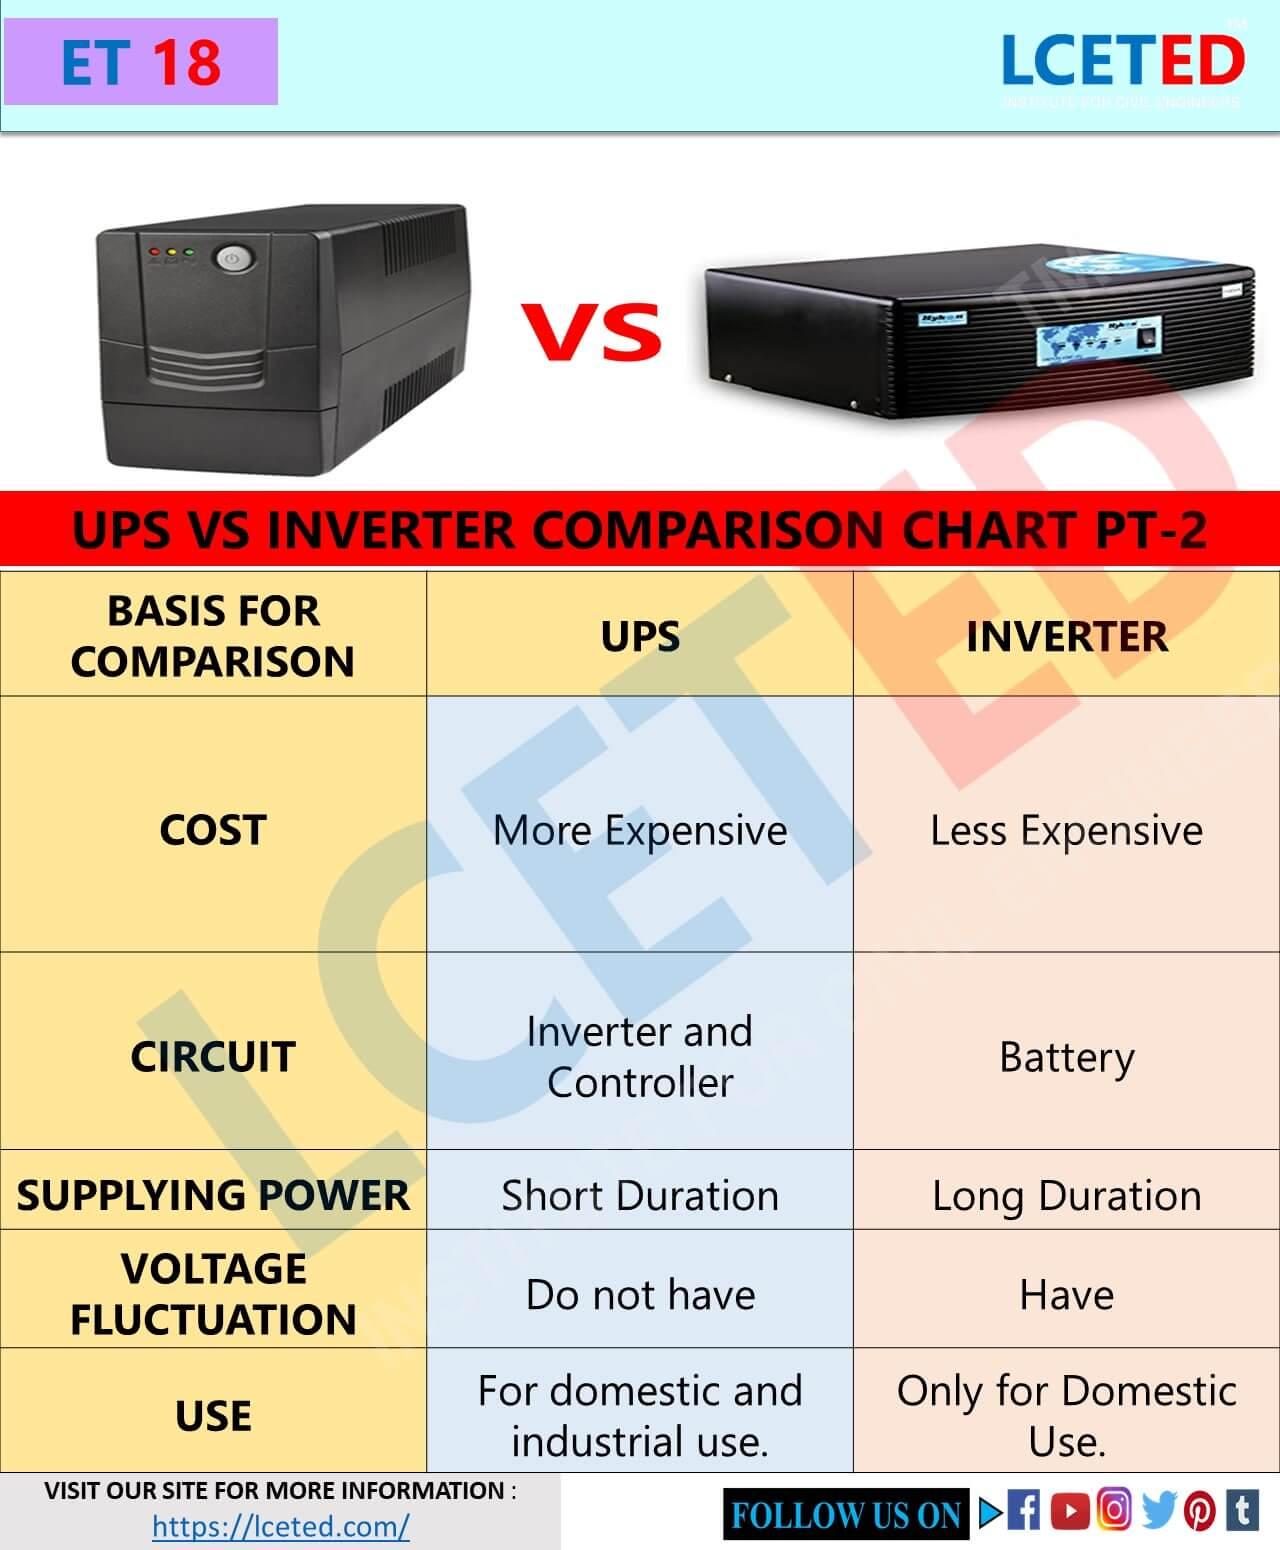 Comparison Between UPS And INVERTER